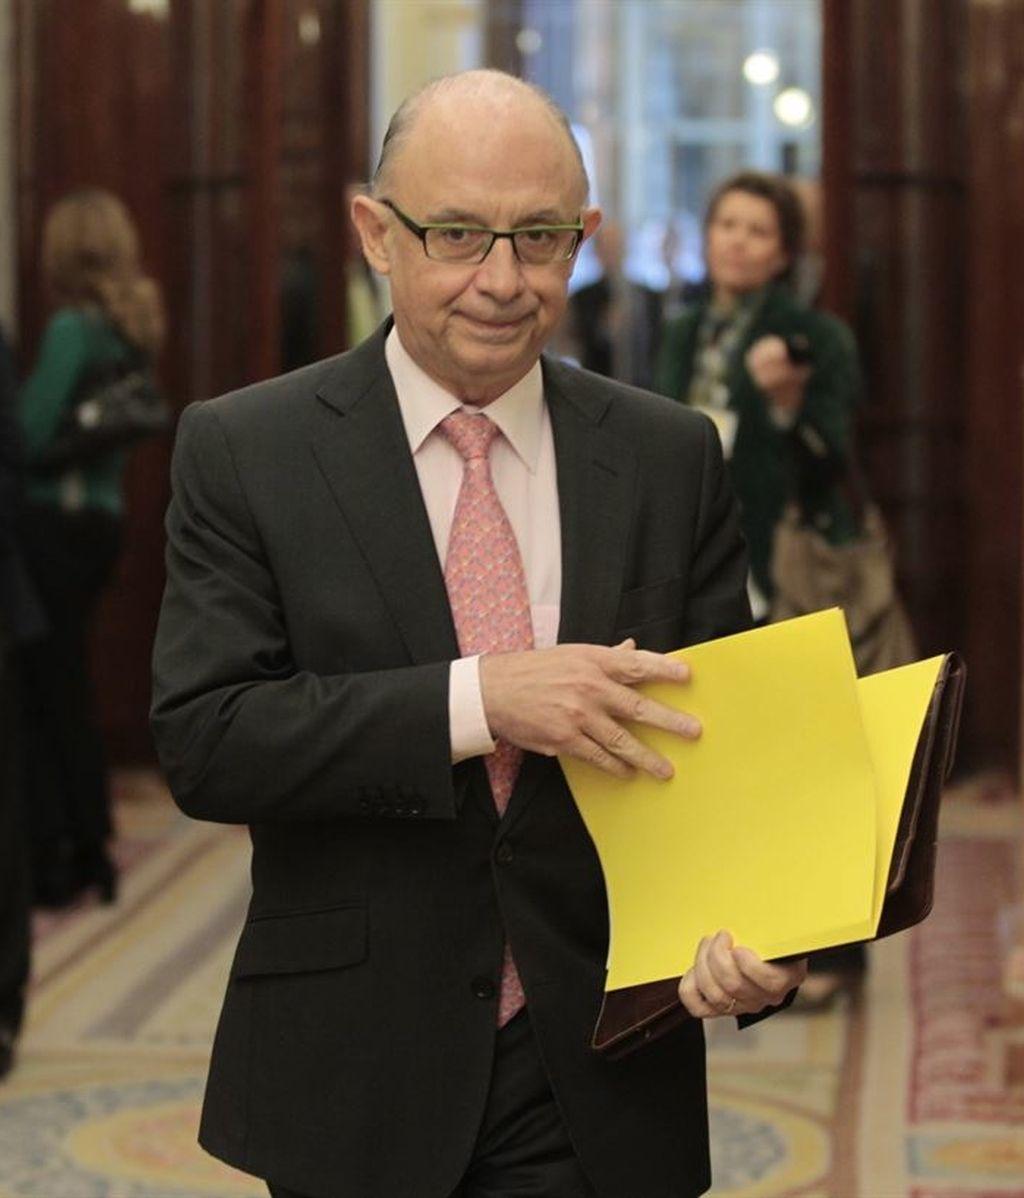 Cristóbal Montoro